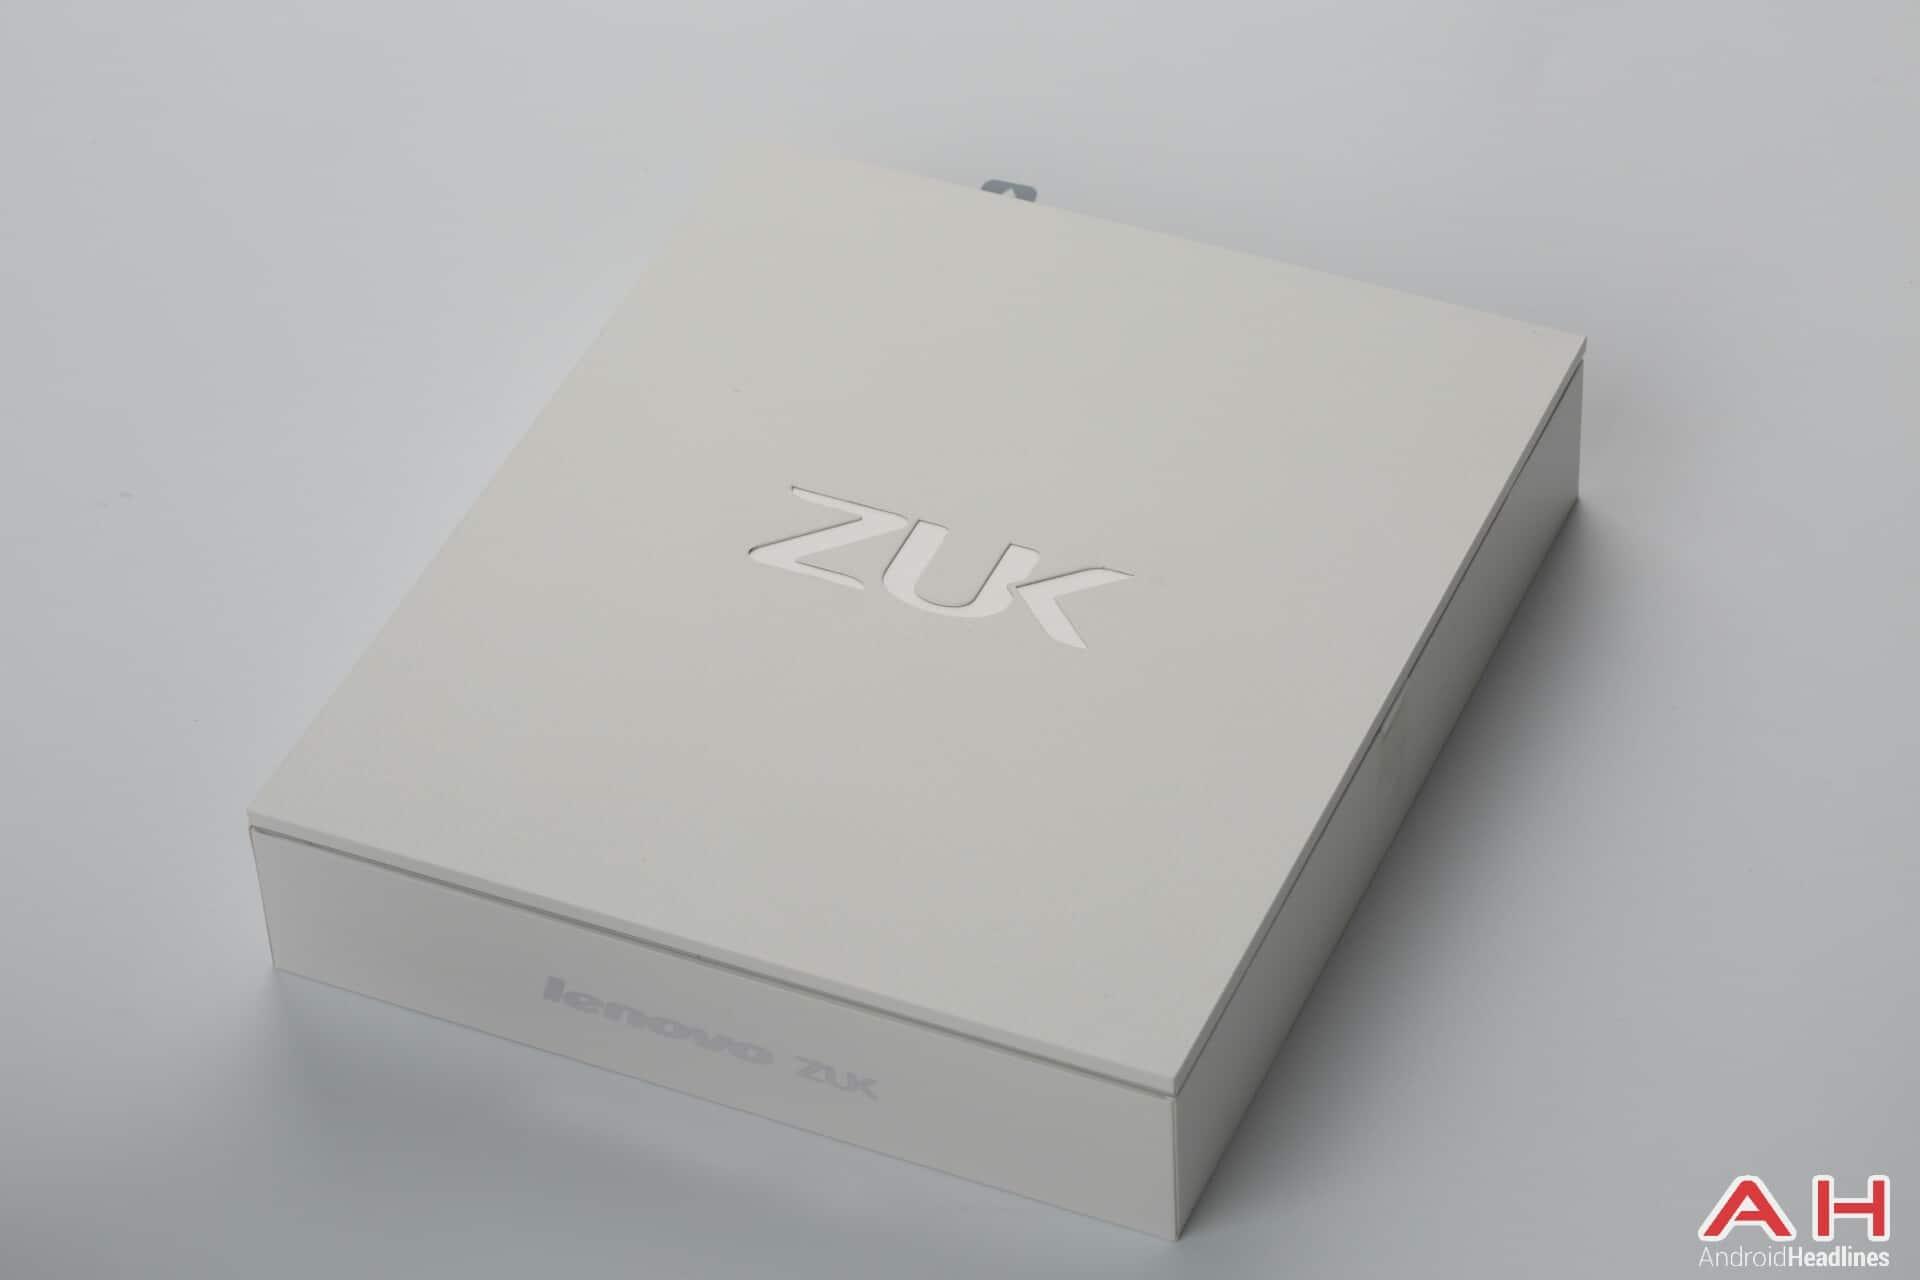 ZUK Z1 international version 3